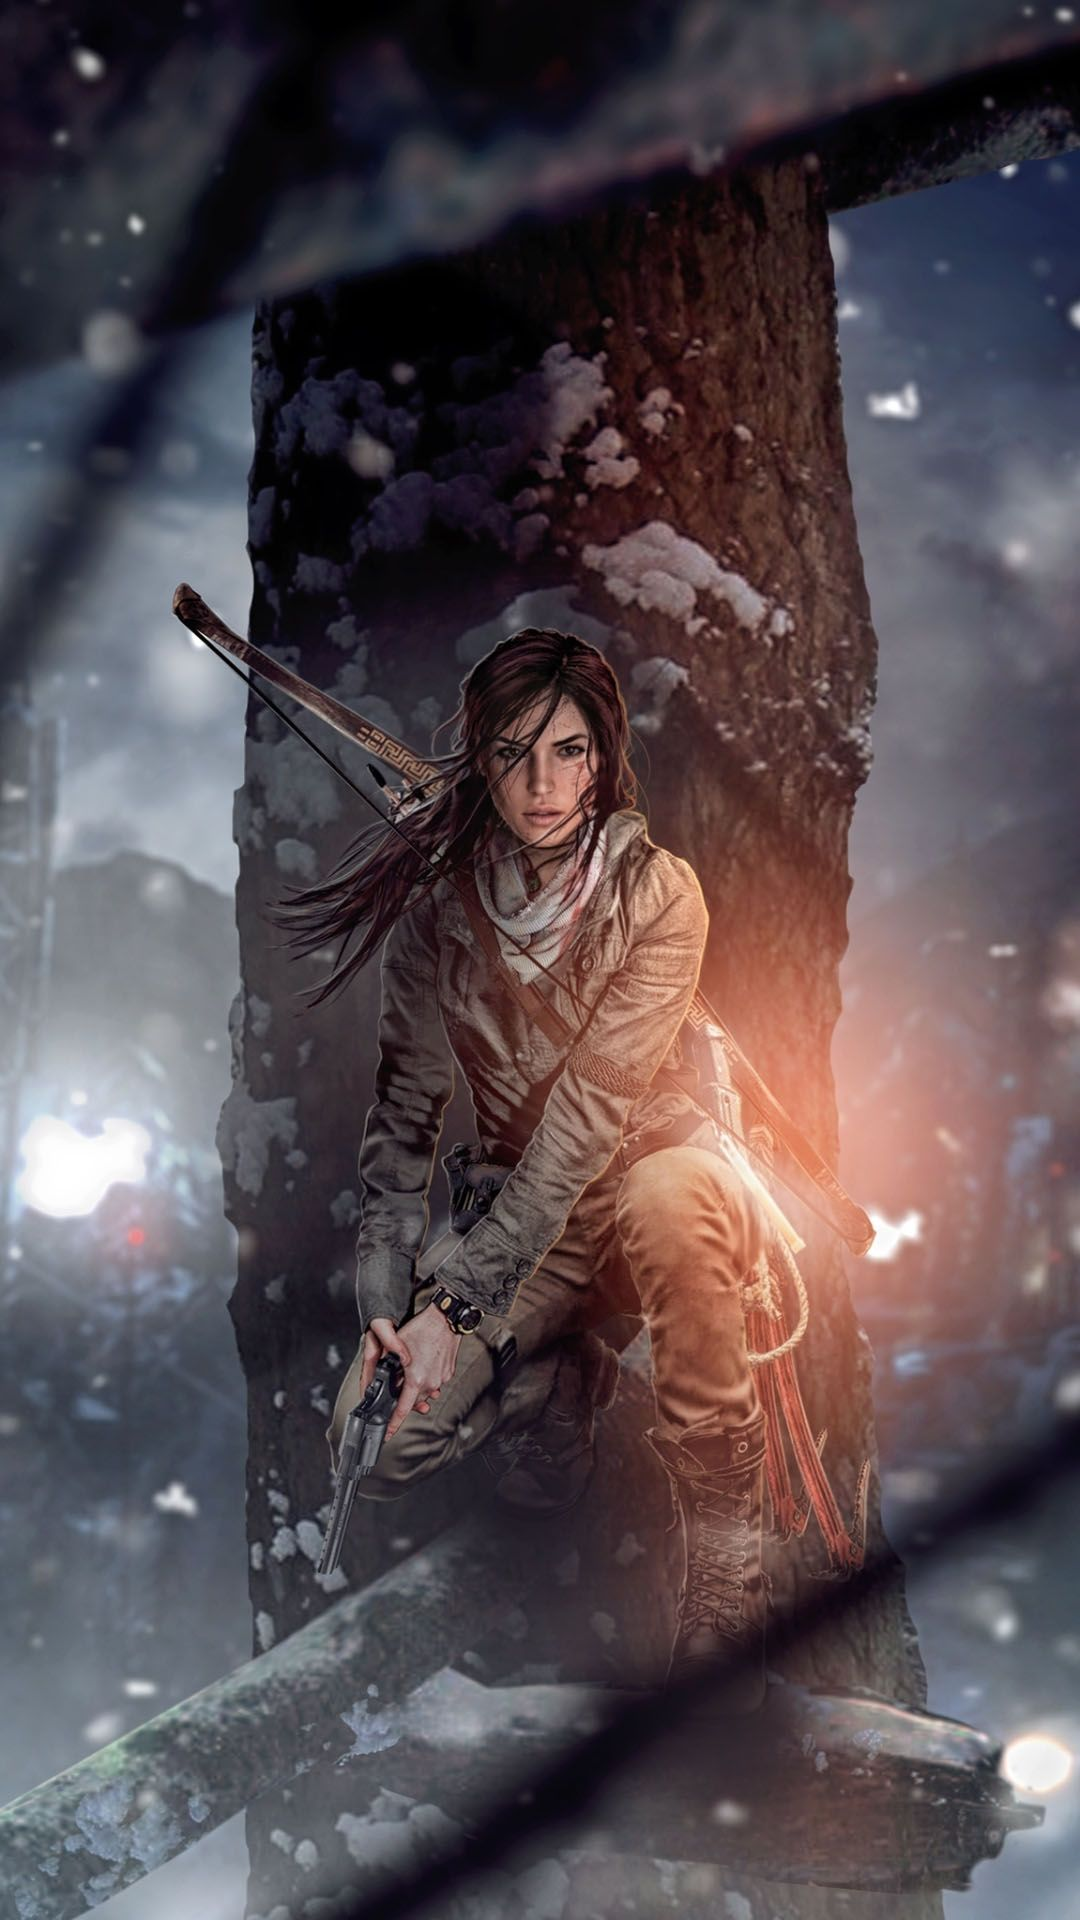 Lara Croft Tomb Raider Tomb Raider Wallpaper Tomb Raider Game